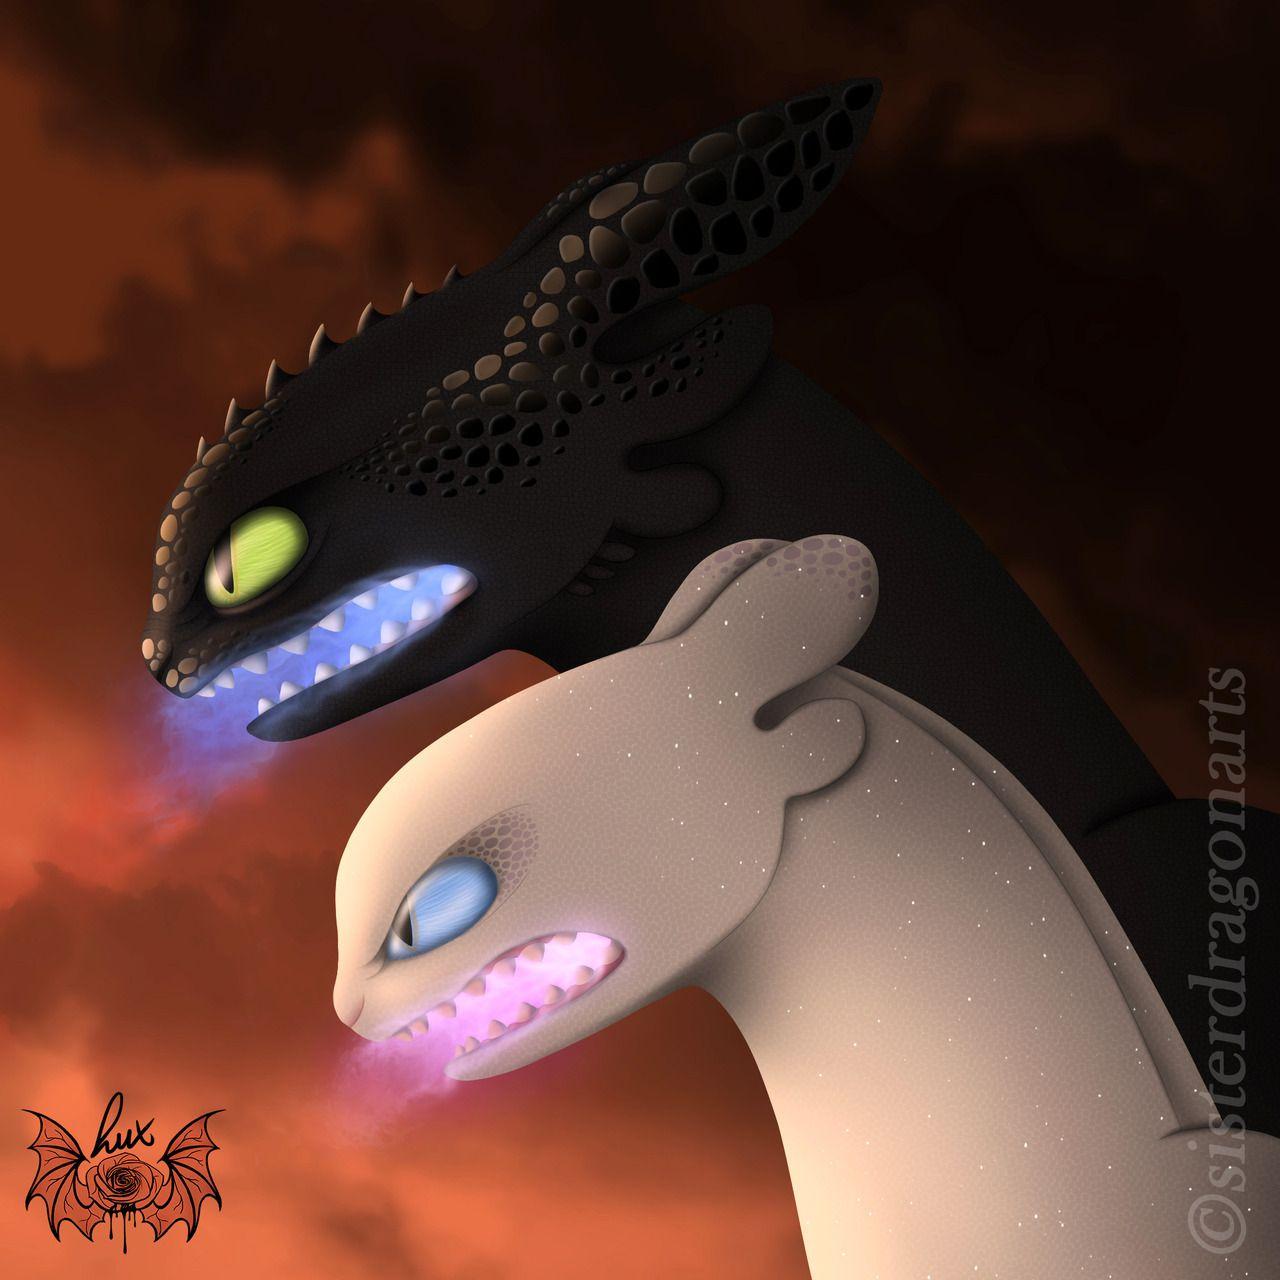 Tumblr Peg7txwzzu1xx2n3xo1 1280 Jpg 1280 1280 Cómo Entrenar A Tu Dragón Entrenando A Tu Dragon Dragones